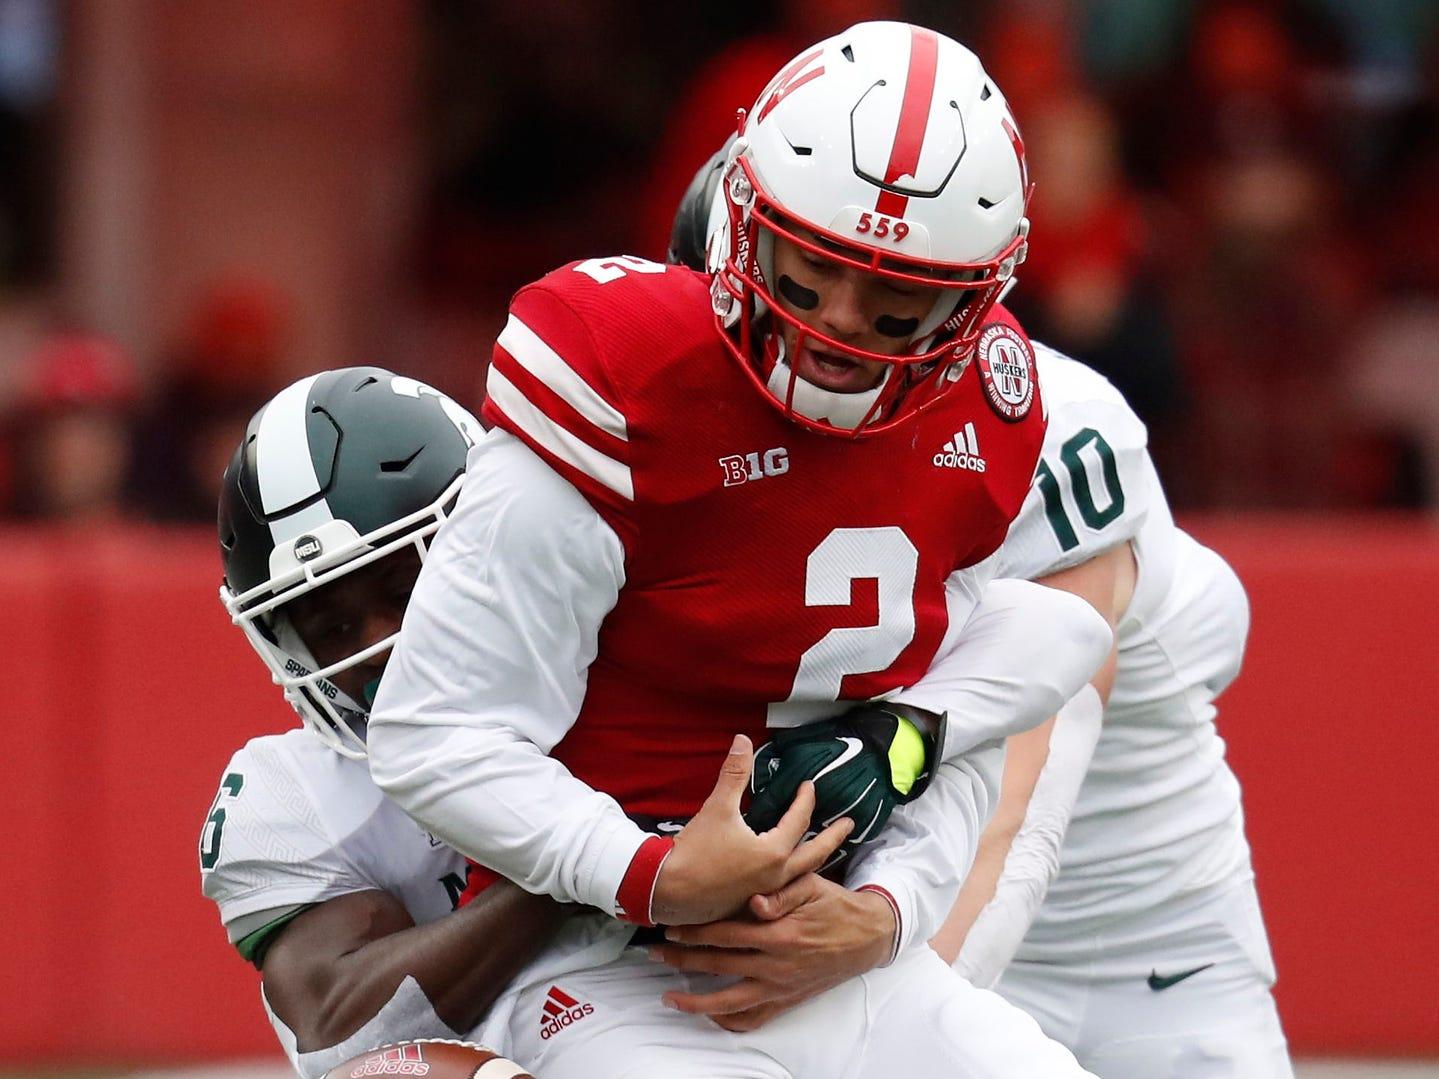 Nebraska quarterback Adrian Martinez fumbles the ball against Michigan State safety David Dowell in the first half at Memorial Stadium.